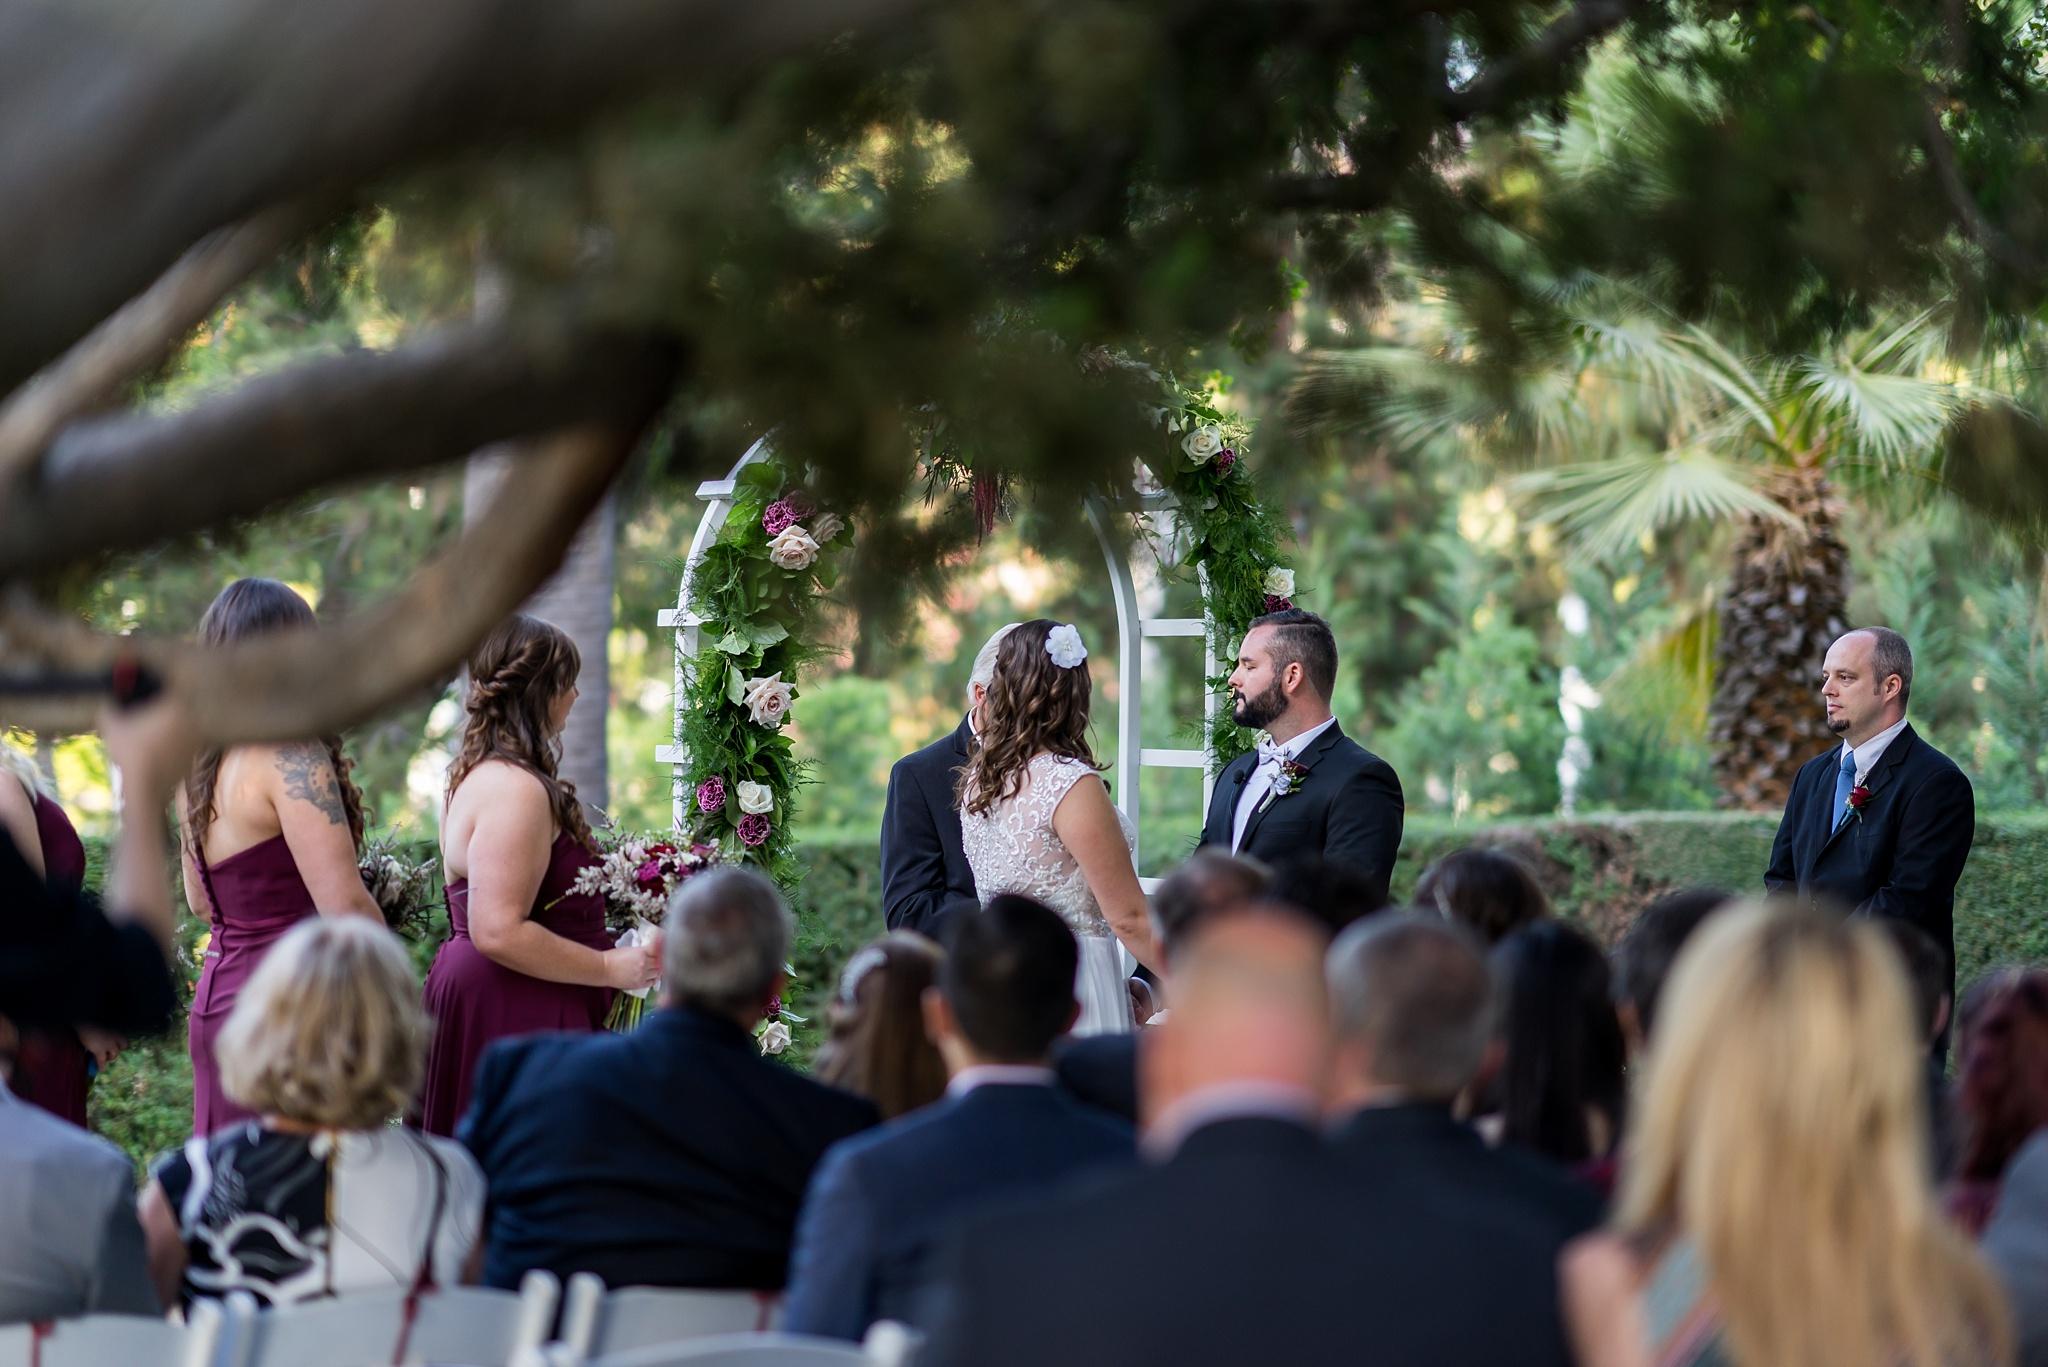 TommyandAmanda_WEDDING_BrienneMichelle_Ceremony_039_BLOG.jpg